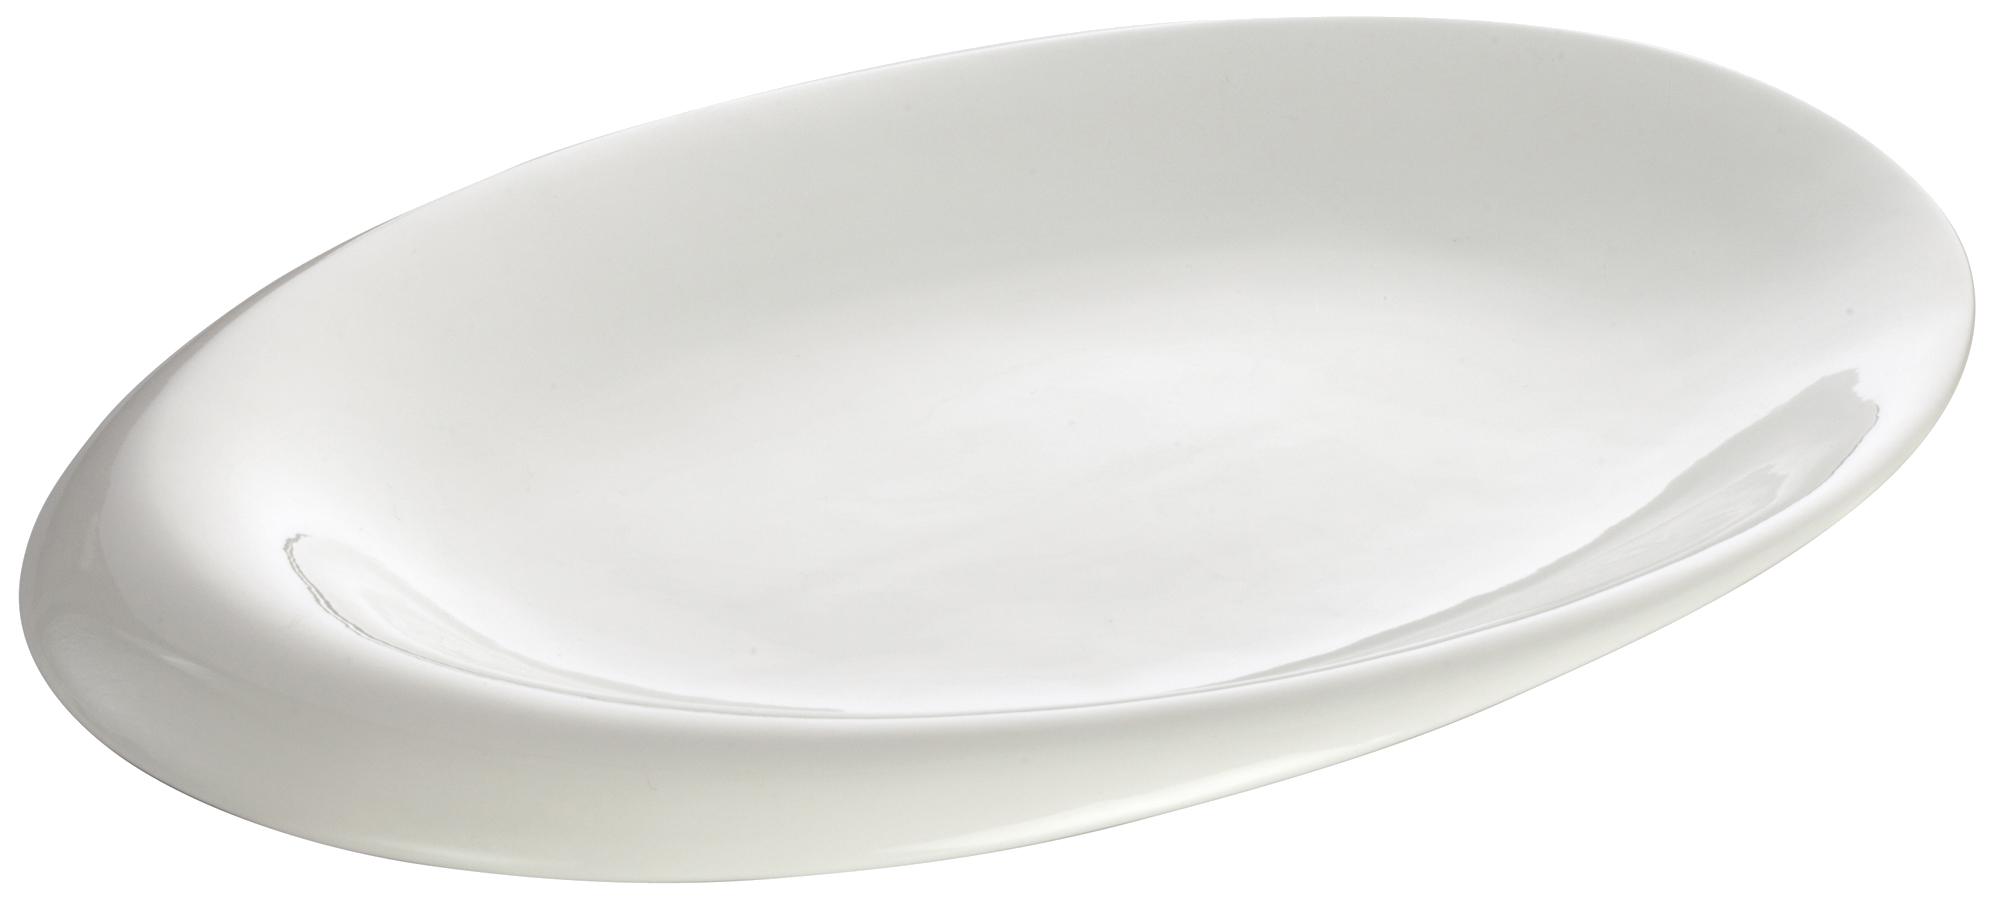 Winco WDP004-212 china, bowl (unknown capacity)